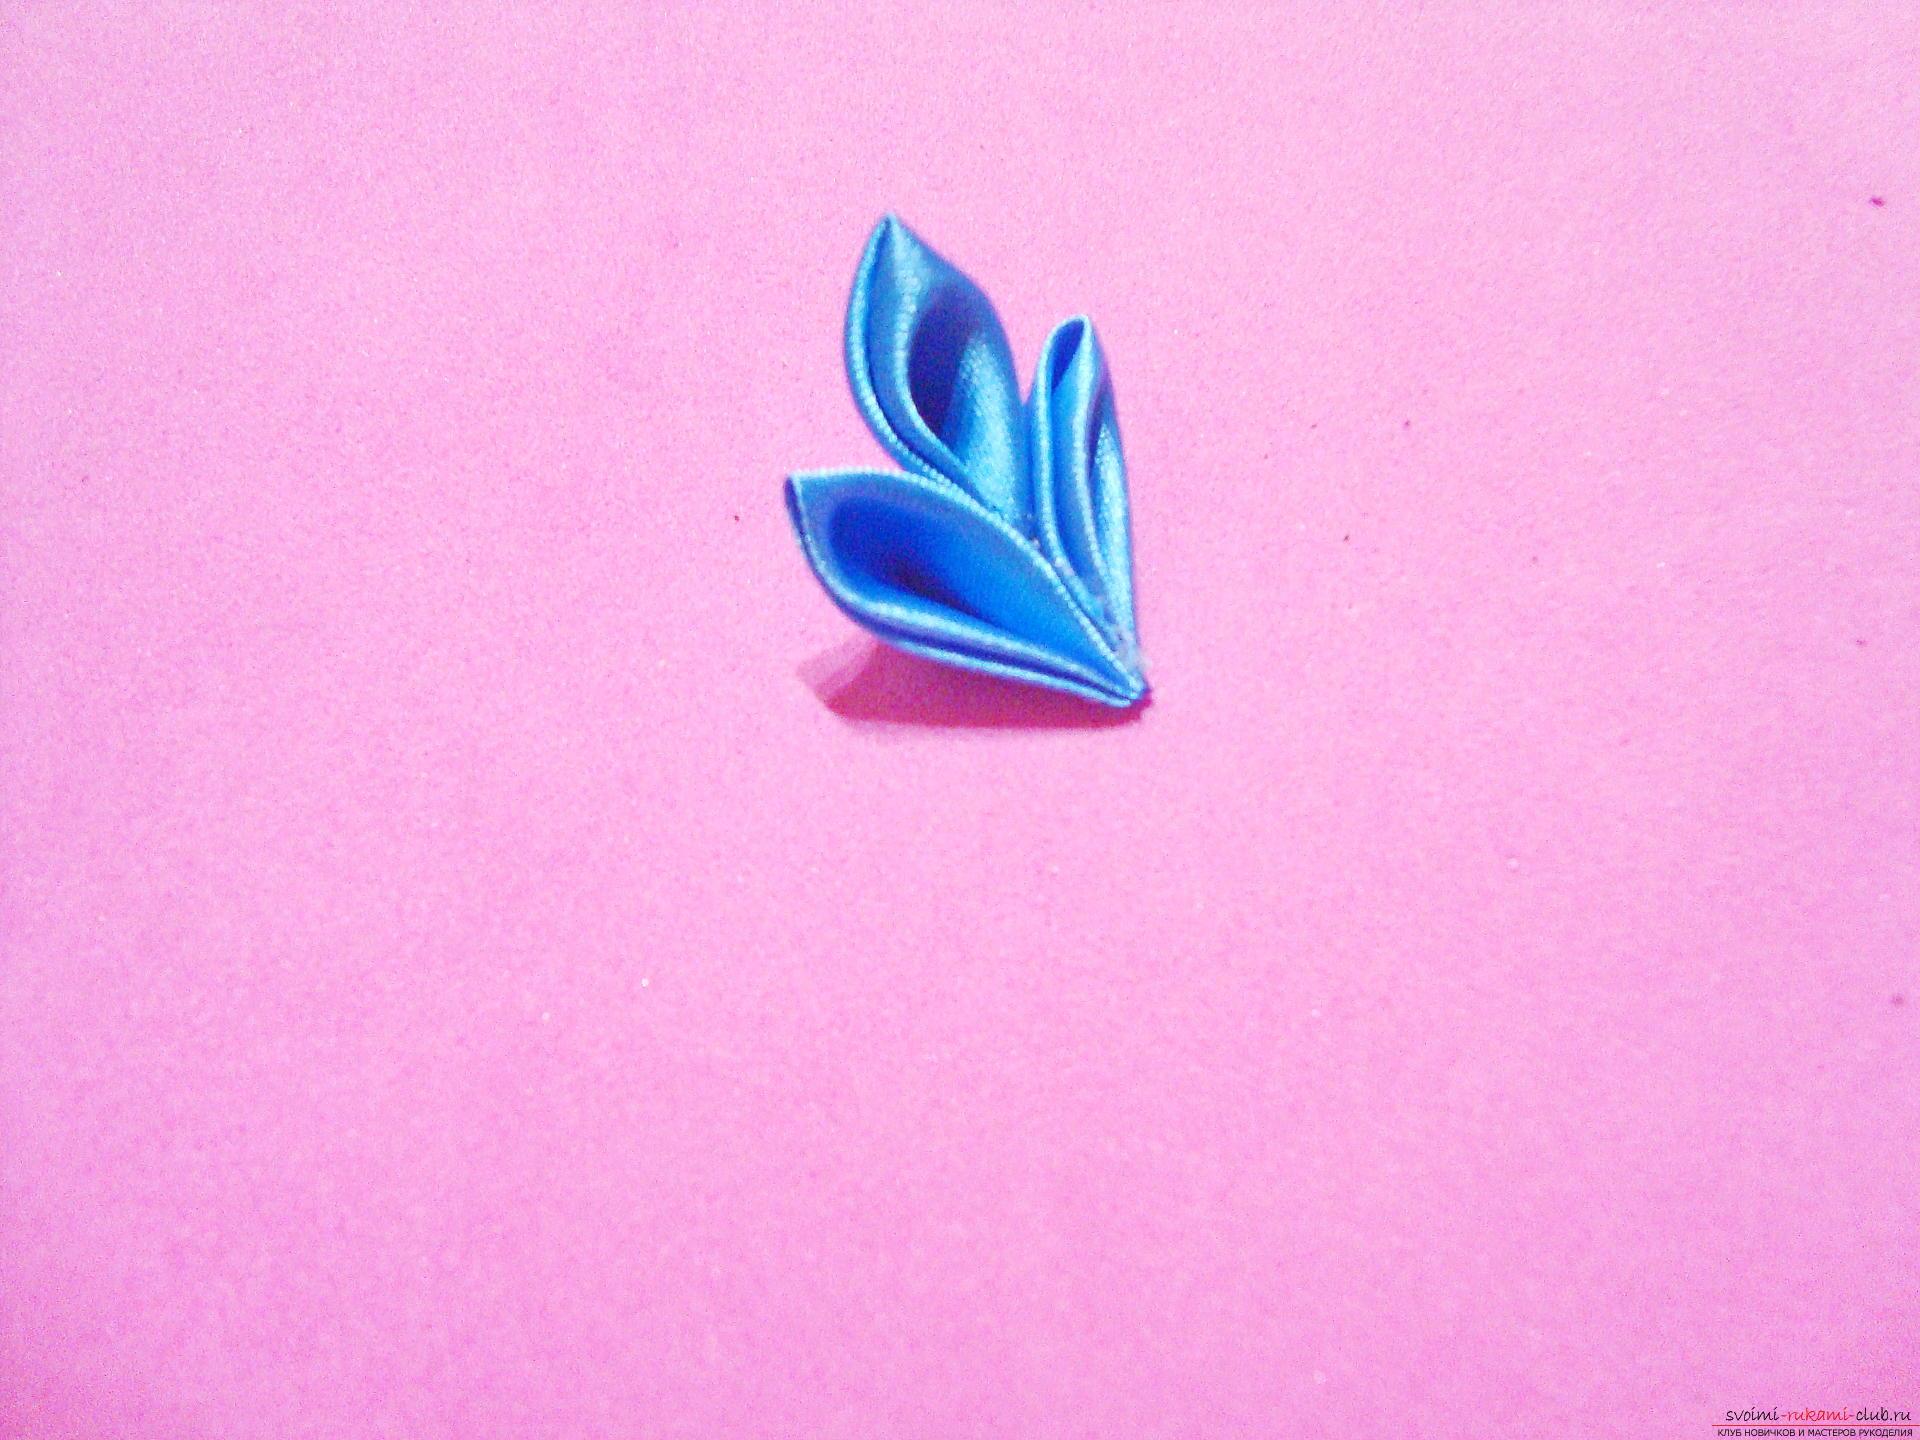 Фото инструкция по изготовлению заколки из лент голубого цвета в технике канзаши. Фото №13